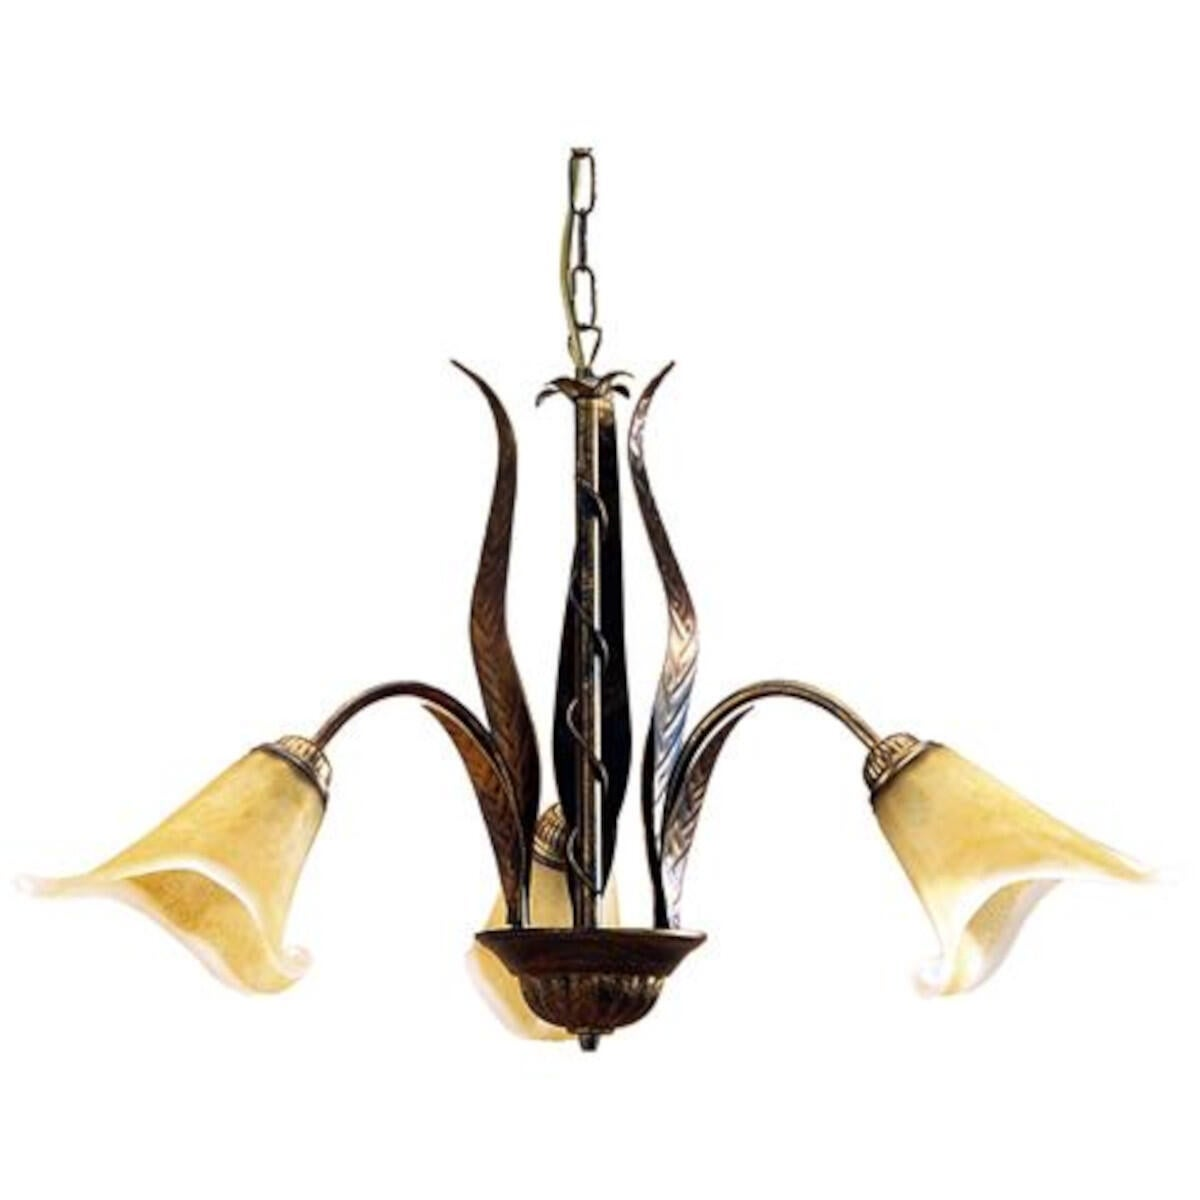 Lampadario Rustico Alga bronzo in ferro, L. 65 cm, 3 luci